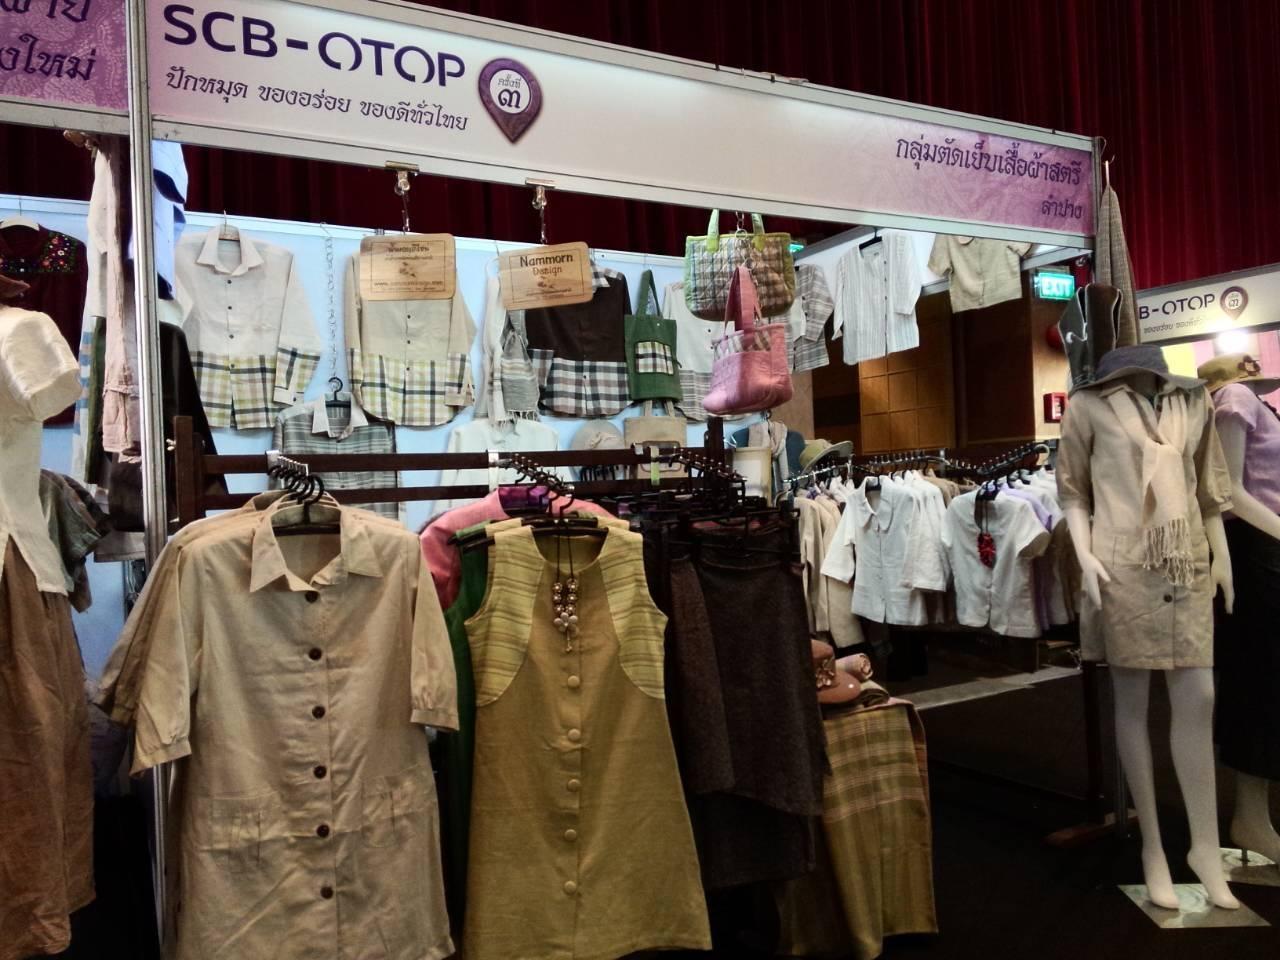 Nammorn Exhibition SCB Otop3 (2)